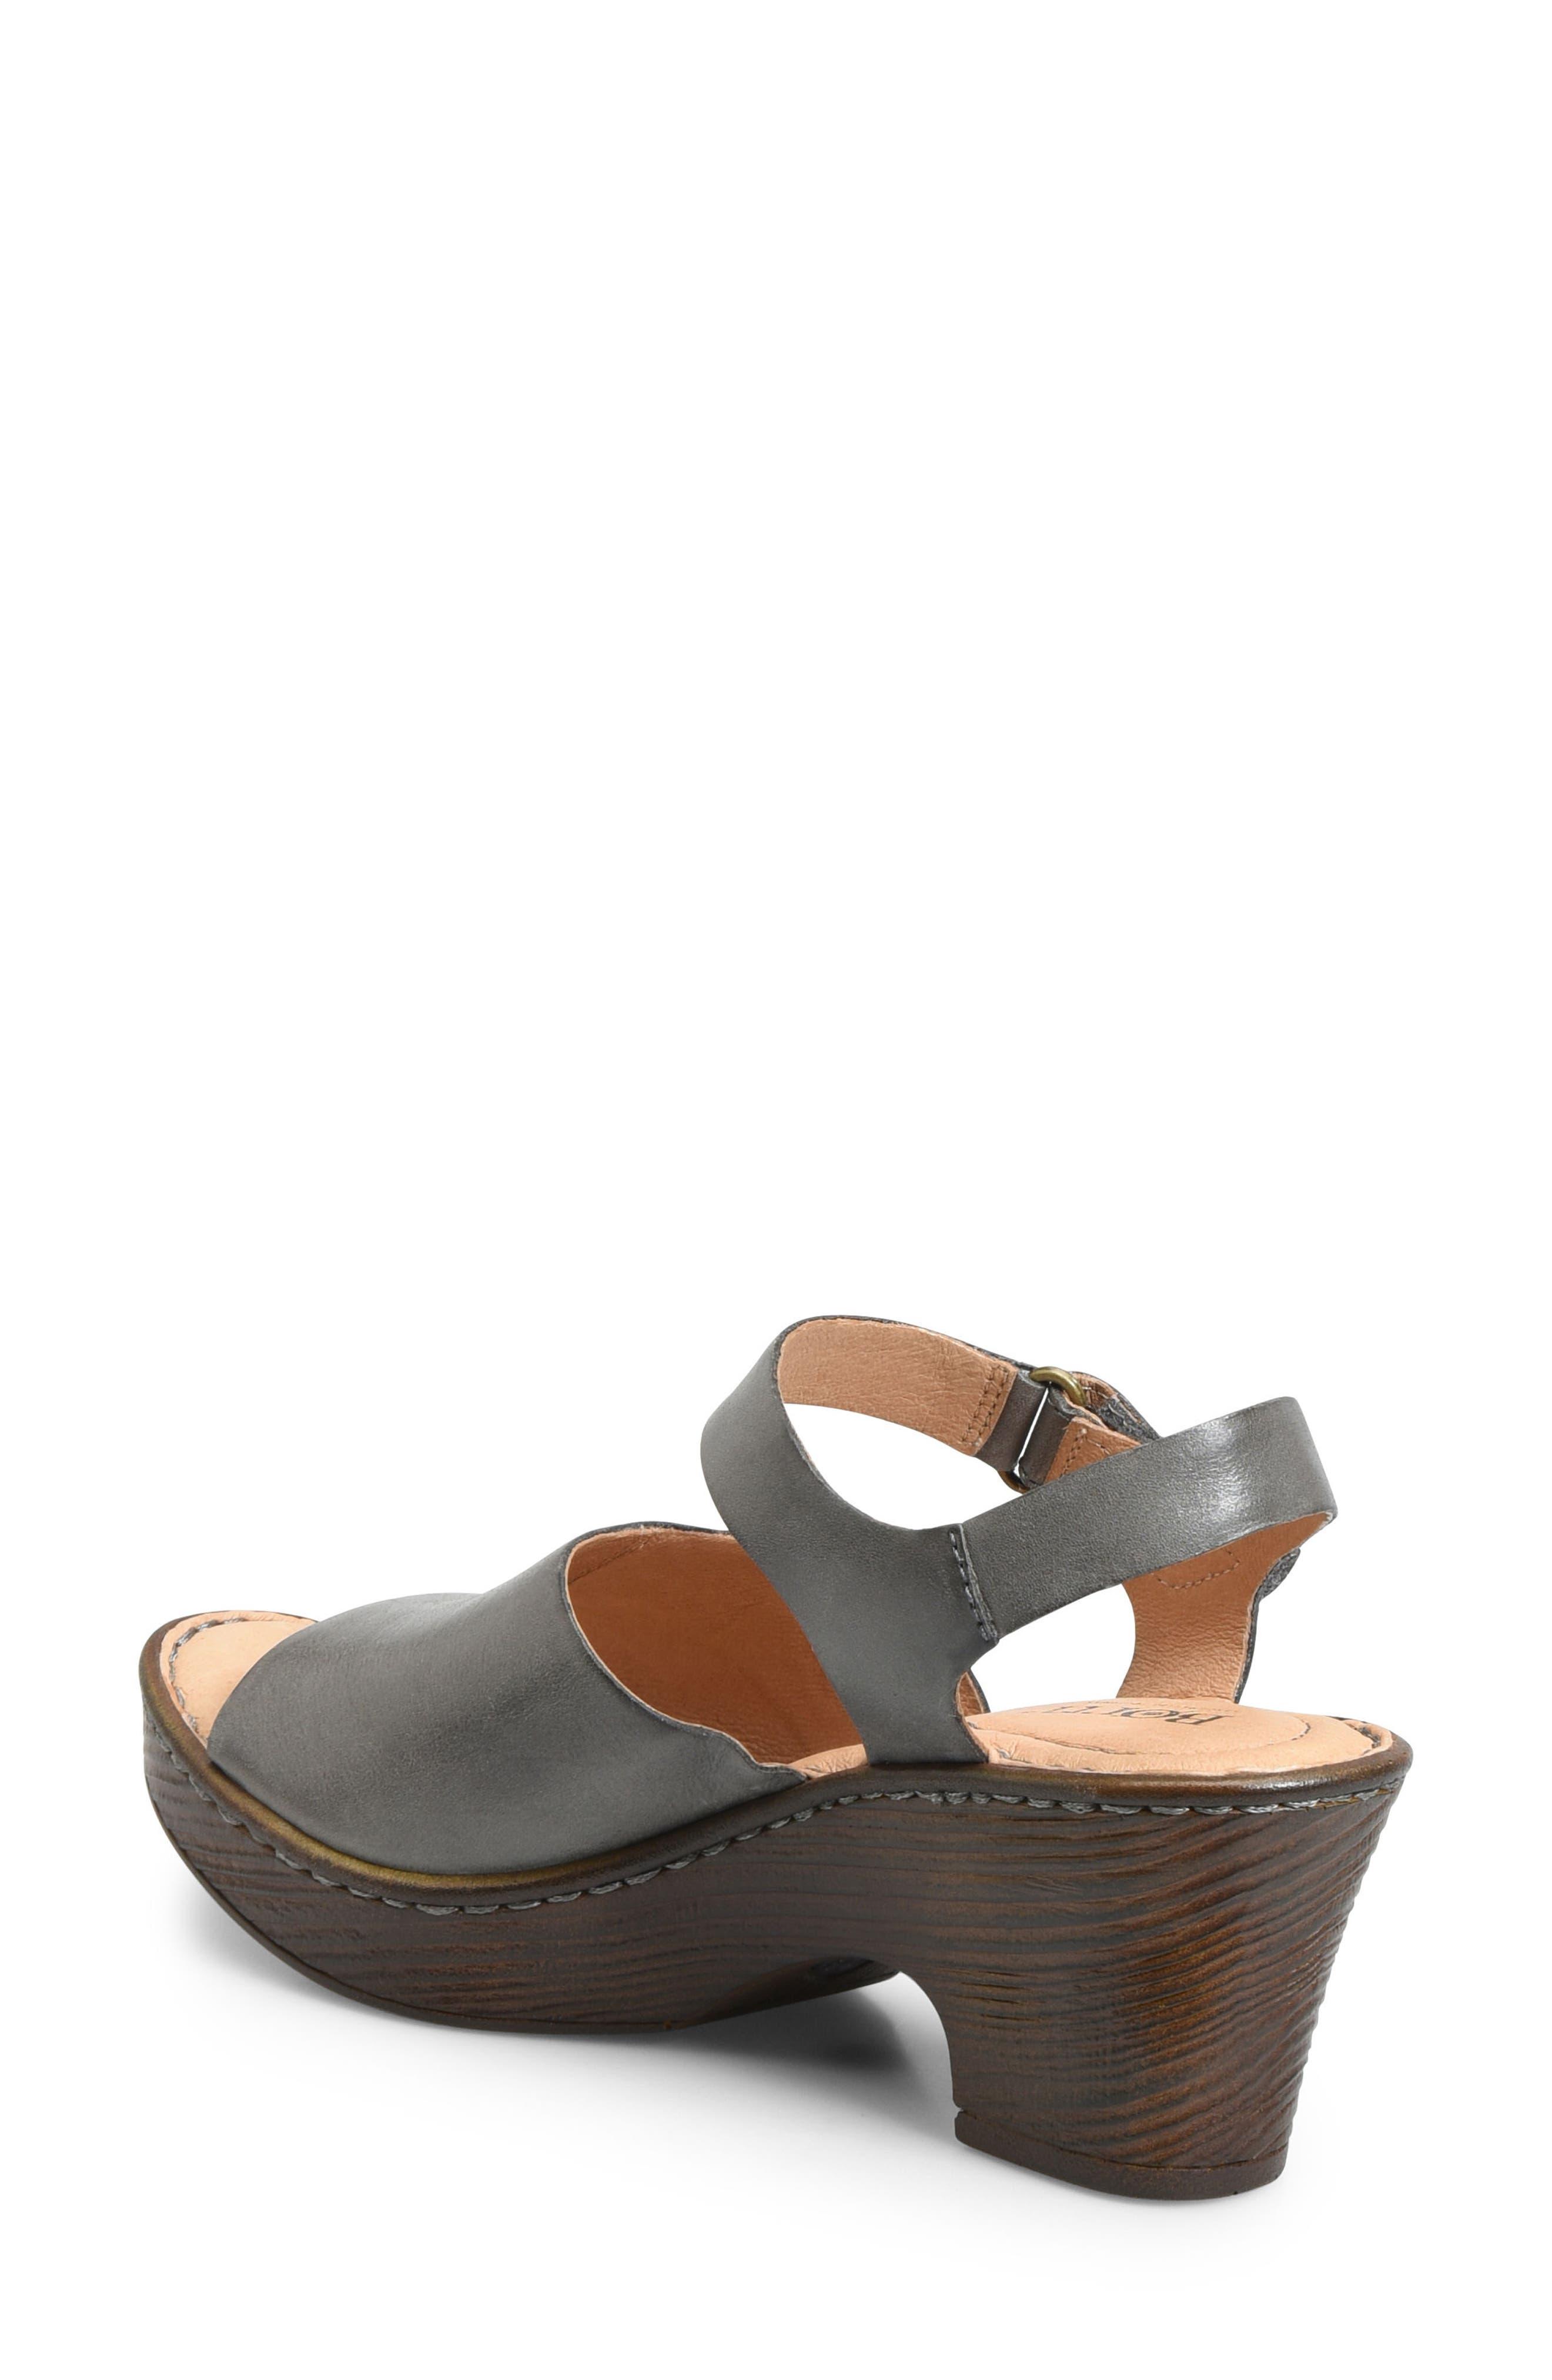 Canna Platform Sandal,                             Alternate thumbnail 2, color,                             Grey Leather